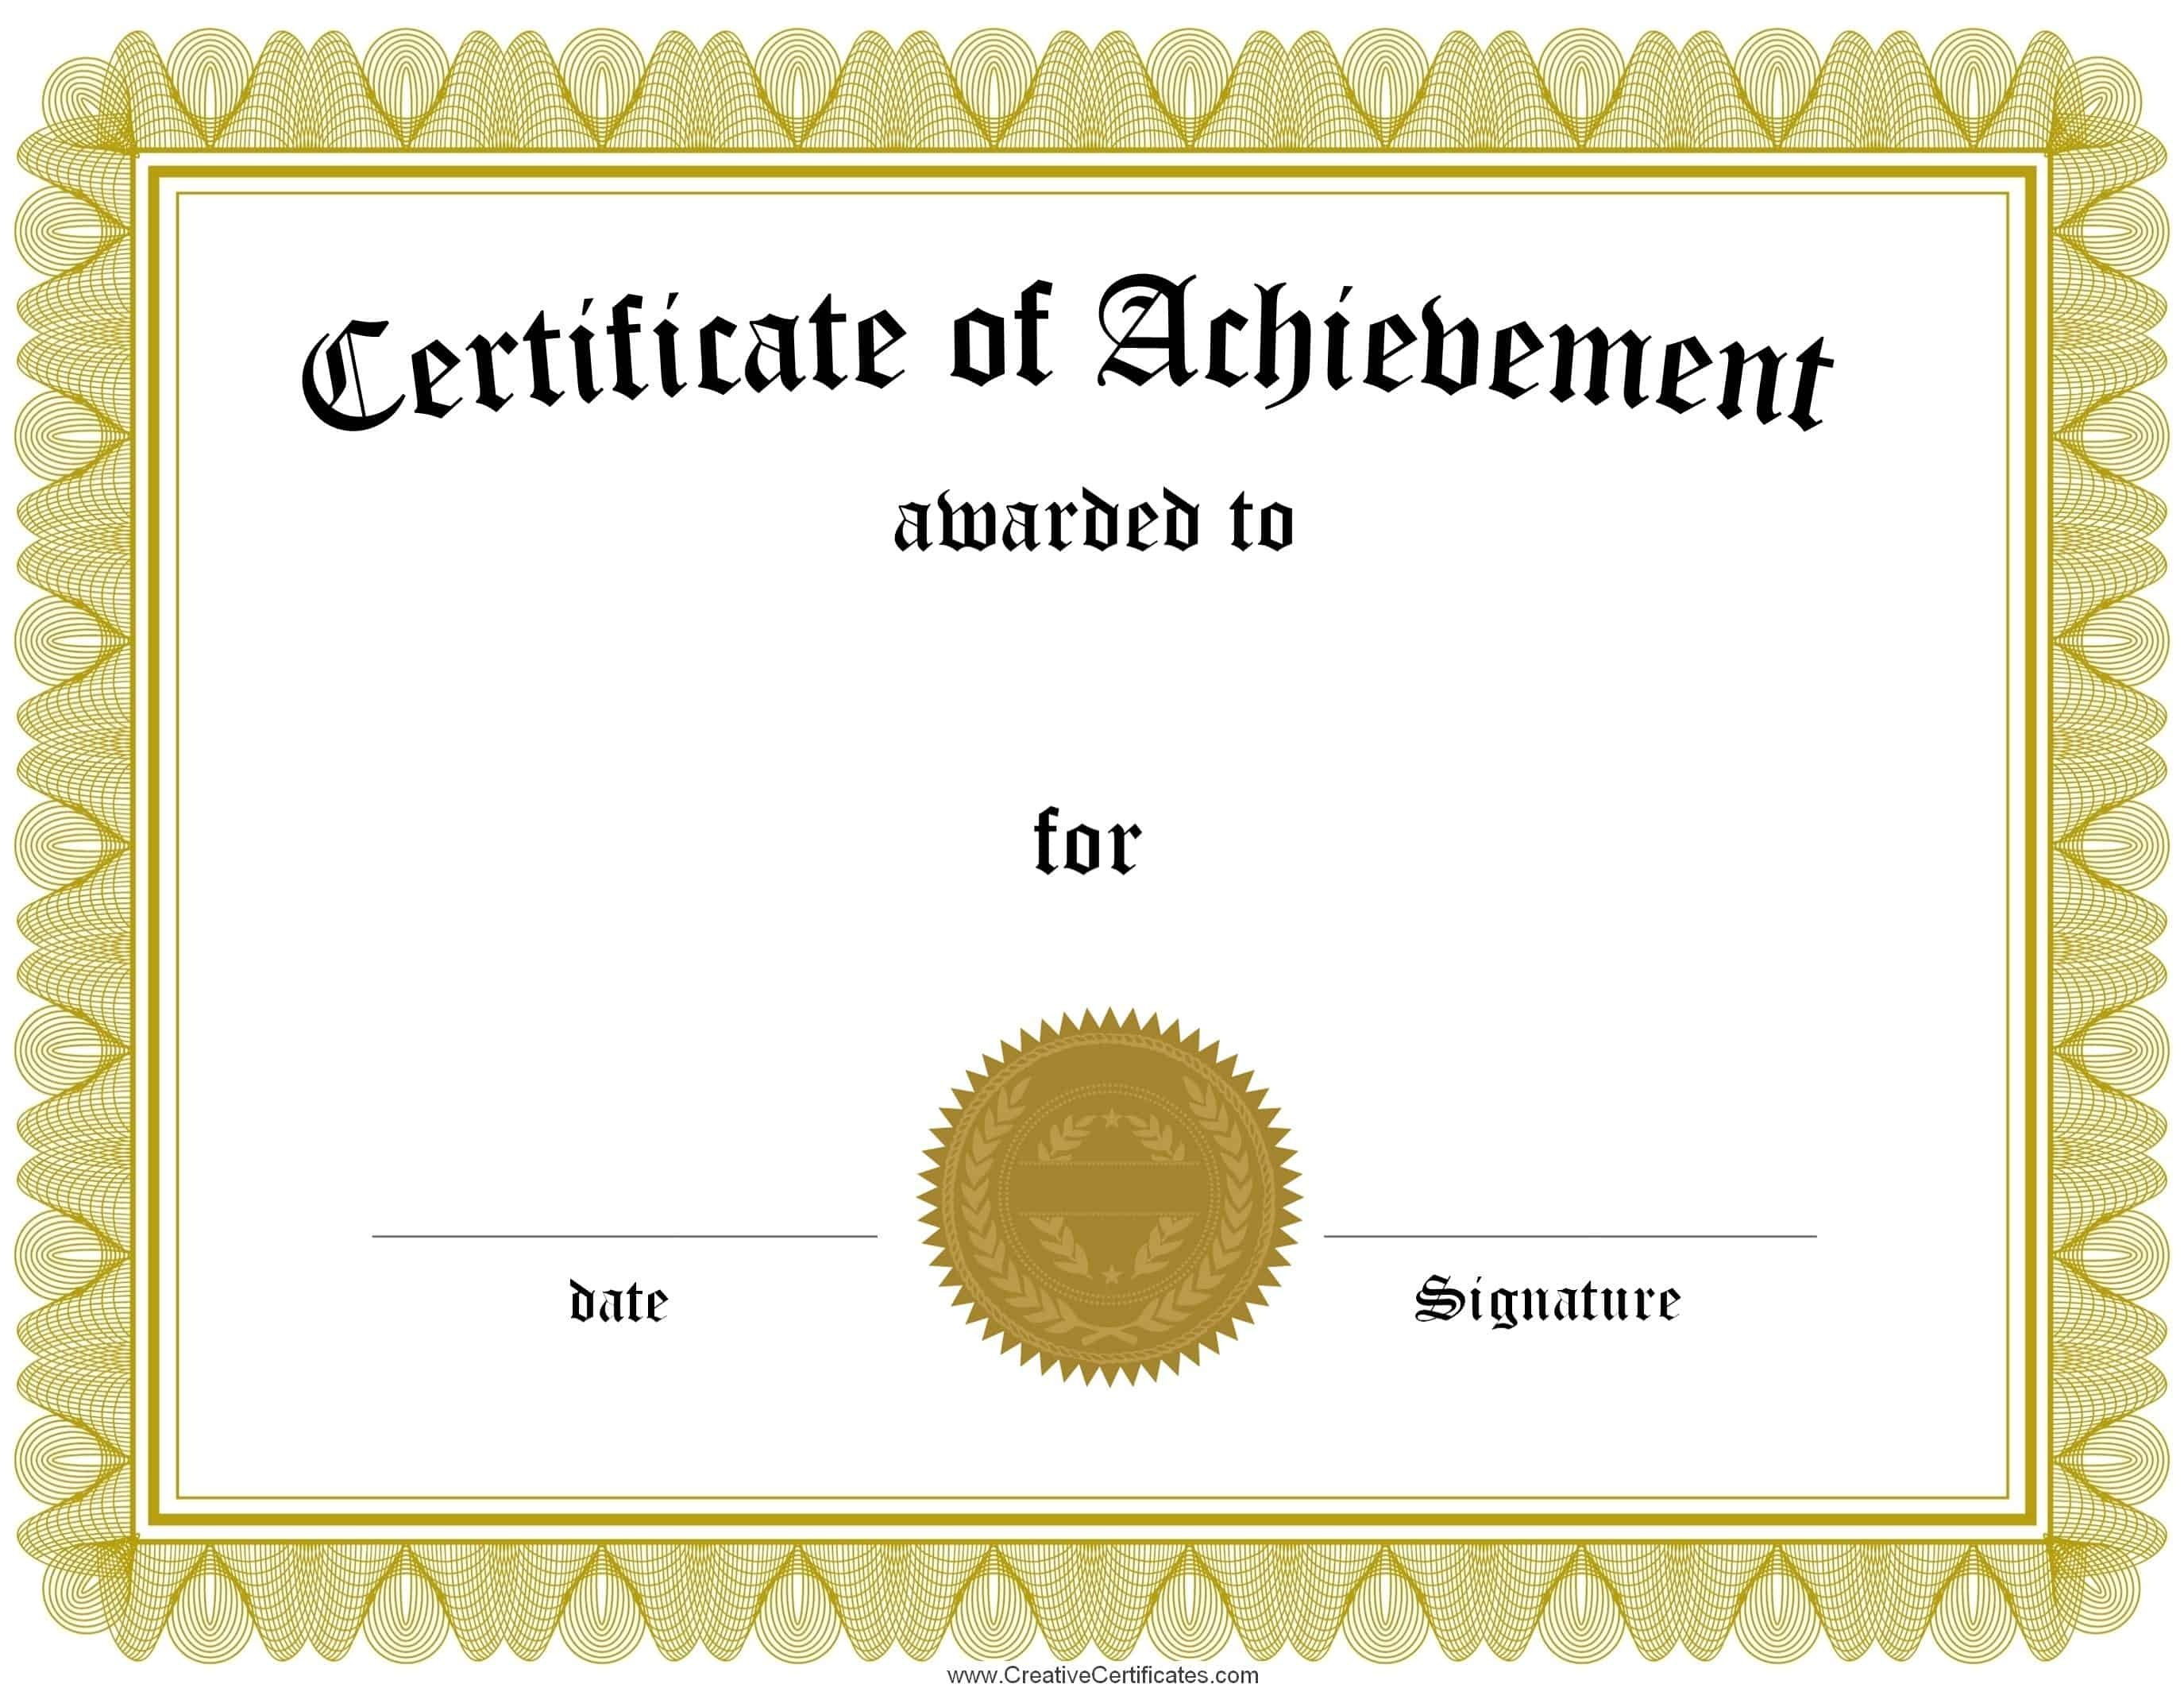 Free Customizable Certificate Of Achievement - Free Customizable Printable Certificates Of Achievement